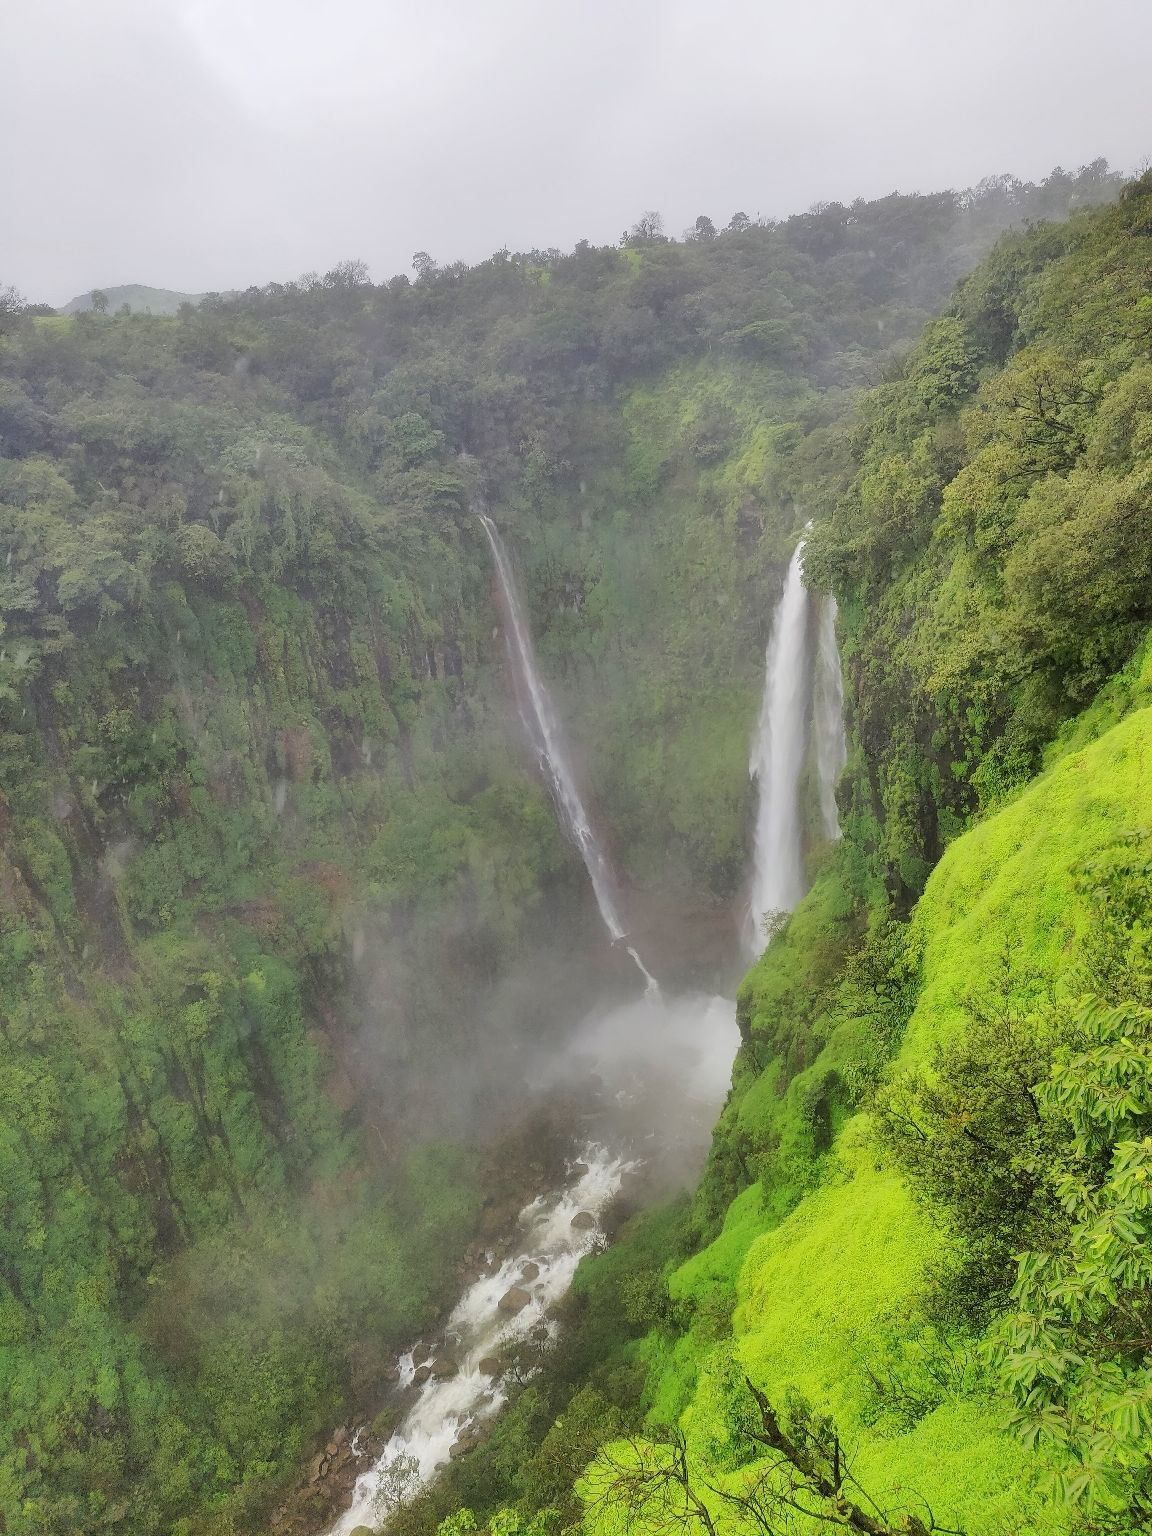 Photo of Thoseghar Waterfall By Vaibhav Jagtap